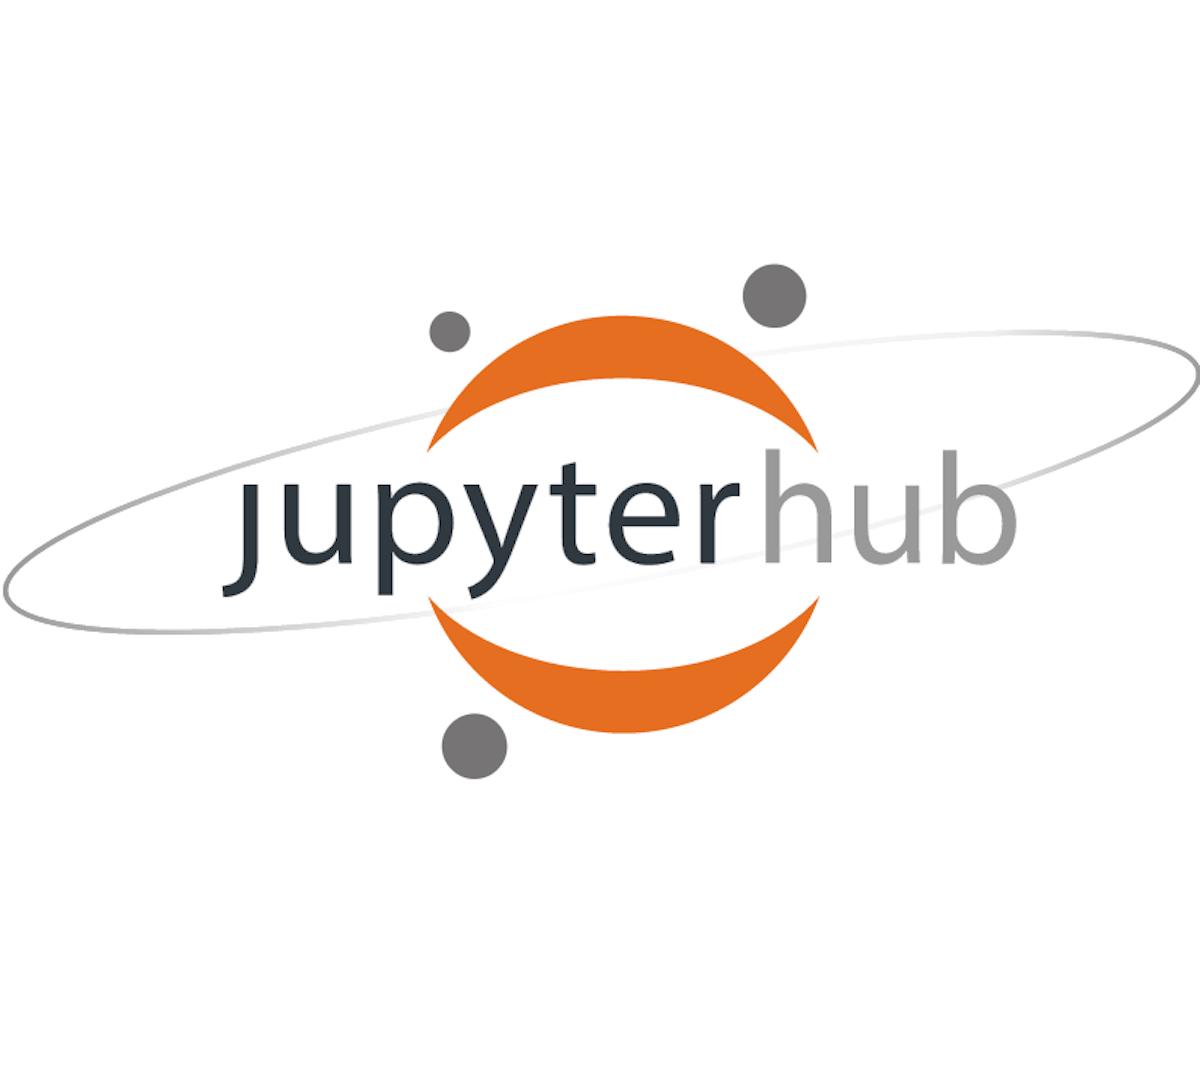 Installing JupyterHub using Pyenv + Anaconda on the AWS EC2